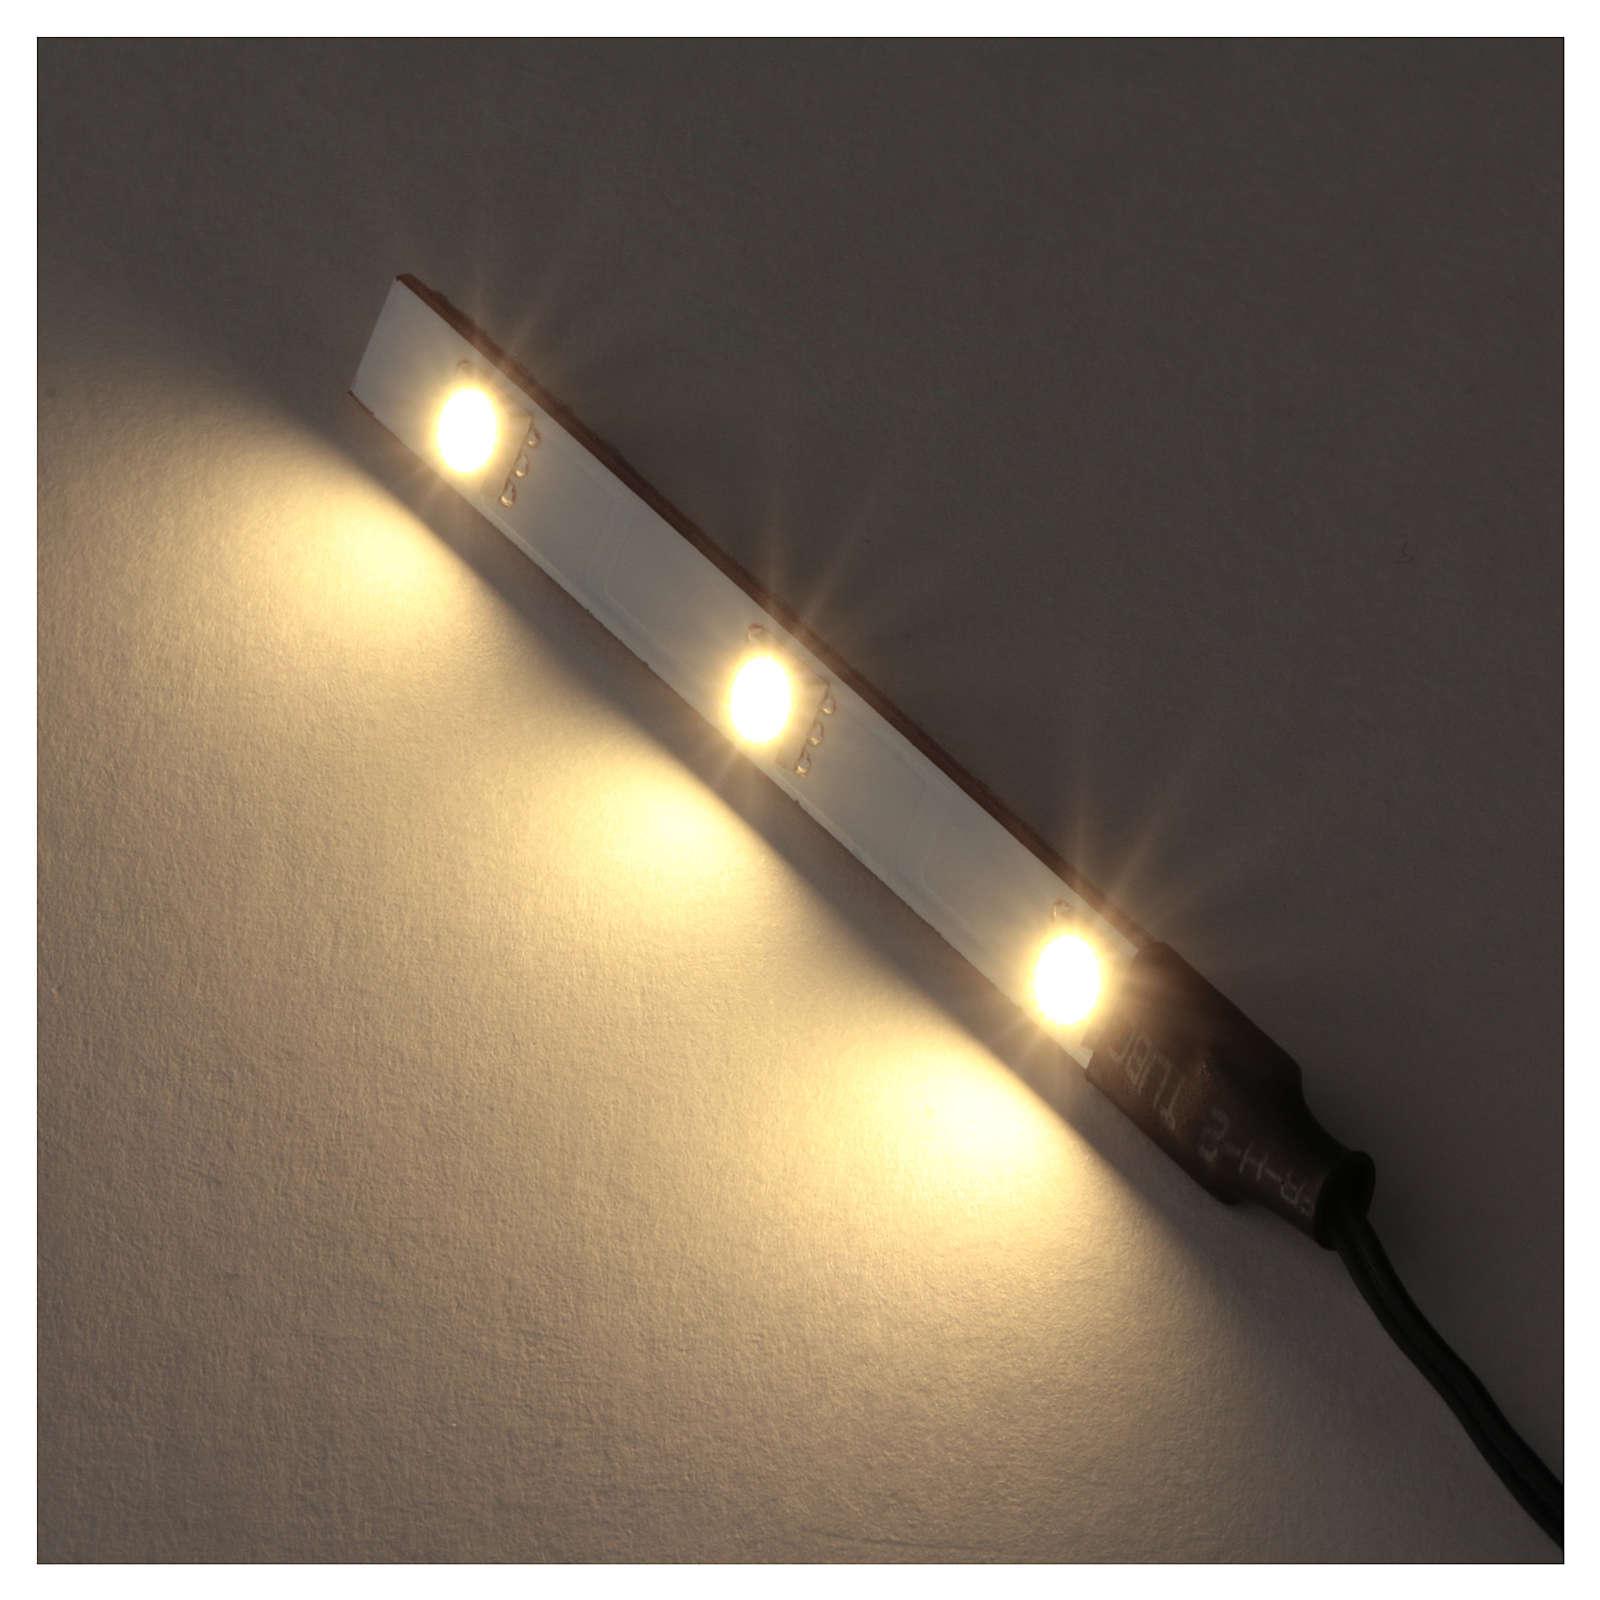 Triple flat low-voltage white led light 4